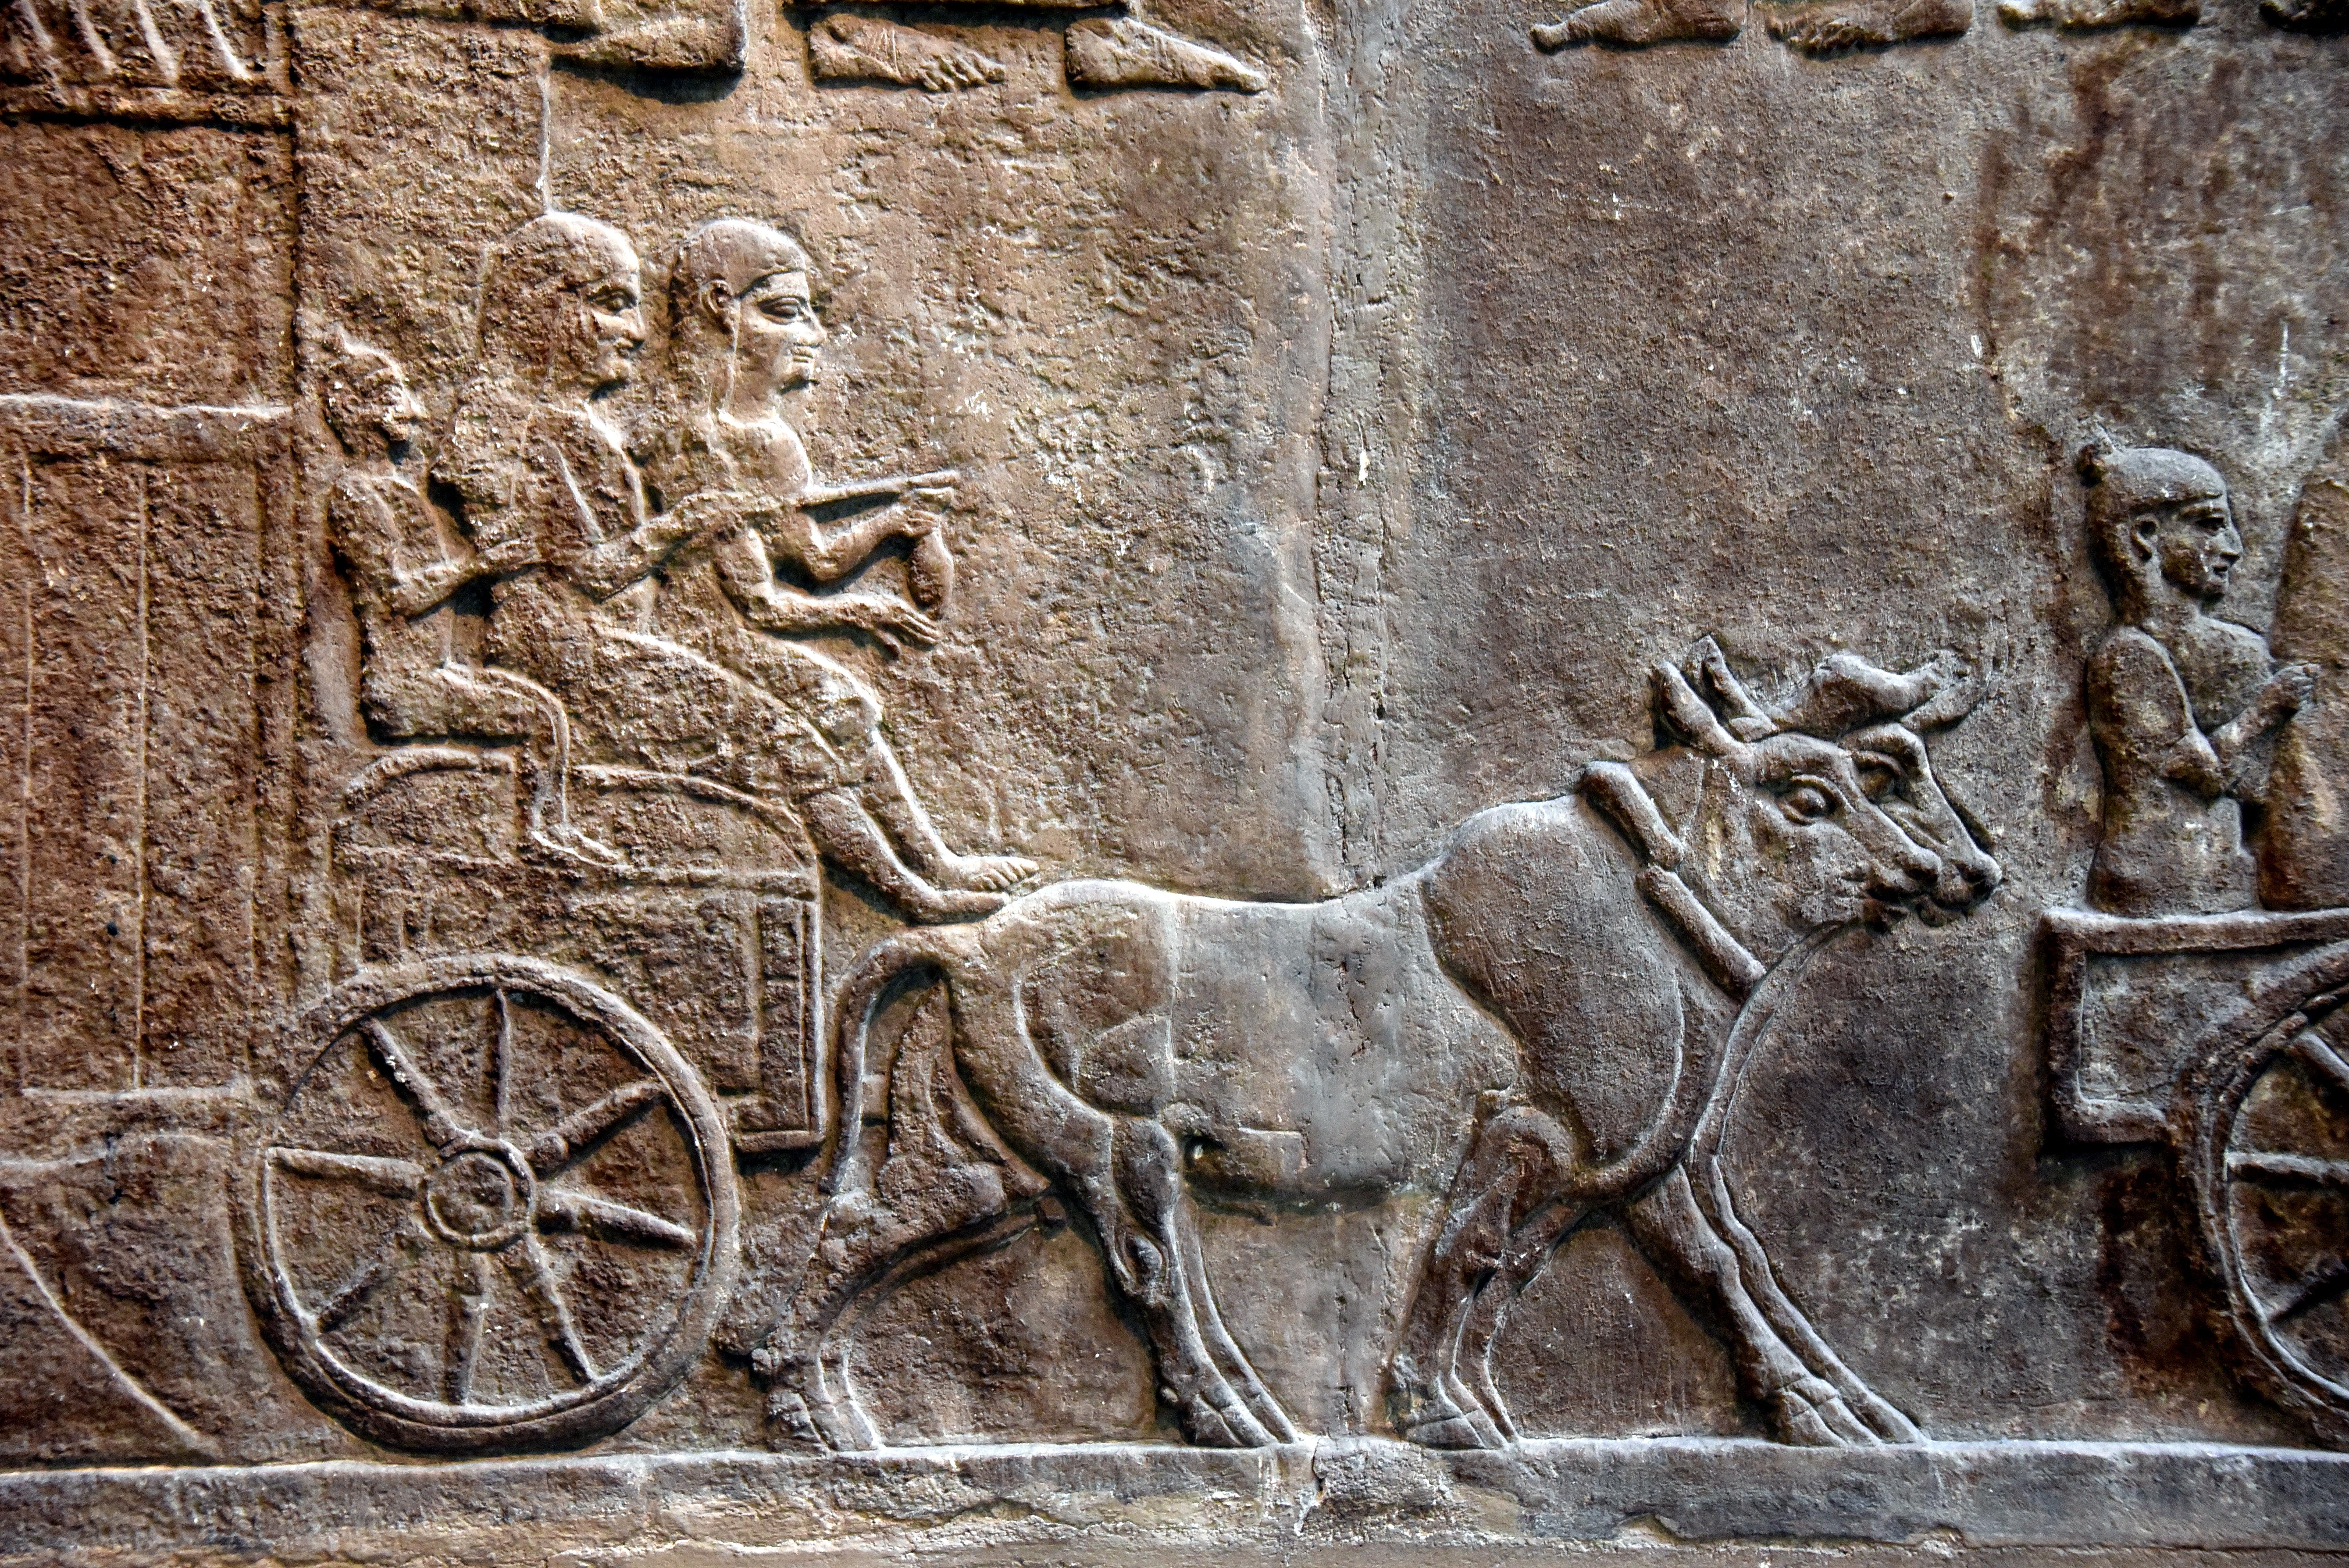 https://upload.wikimedia.org/wikipedia/commons/1/16/Detail%2C_deportation_of_a_city%27s_inhabitant_in_southern_Iraq._From_Nimrud%2C_Iraq%2C_c._728_BCE._British_Museum.jpg